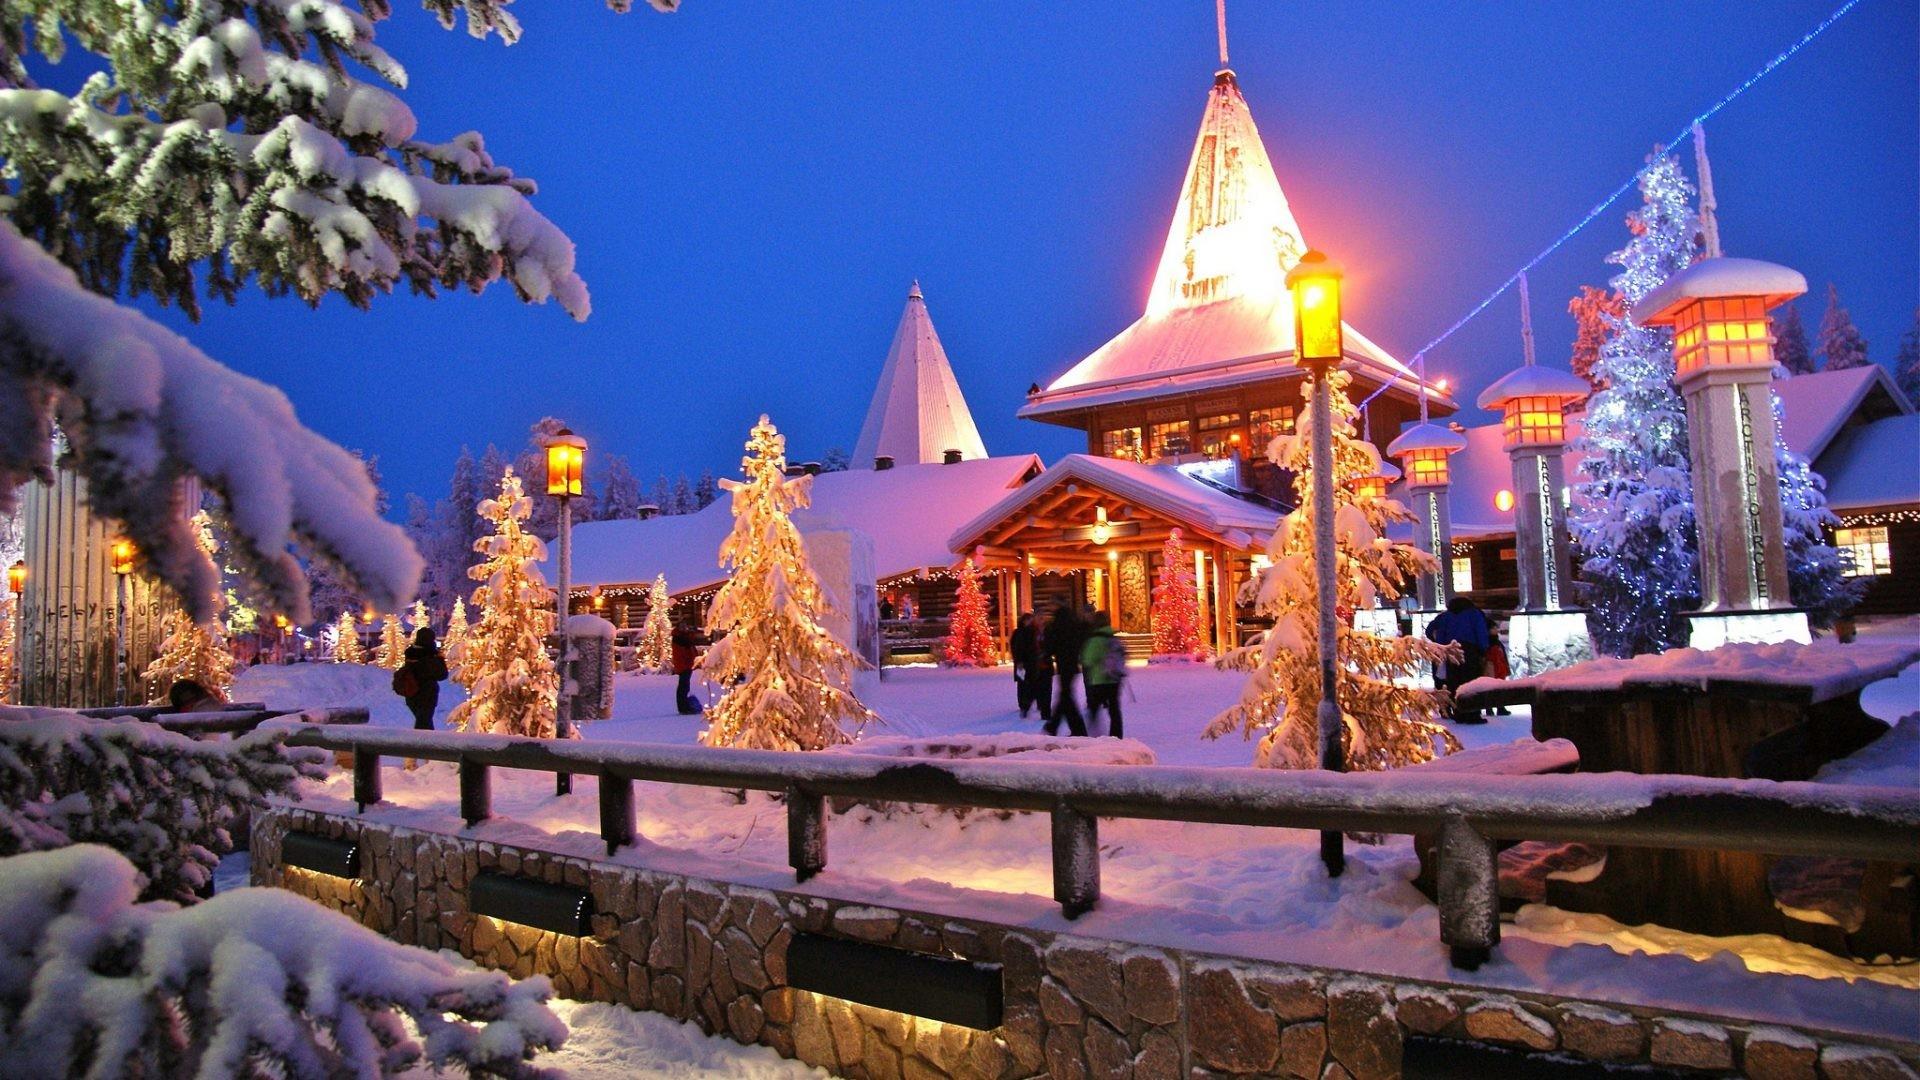 Amusement Parks - Santa Claus Village Rovaniemi Finnland Snow Christmas Winter Building Firs Trees Wide Resolution 1920x1080